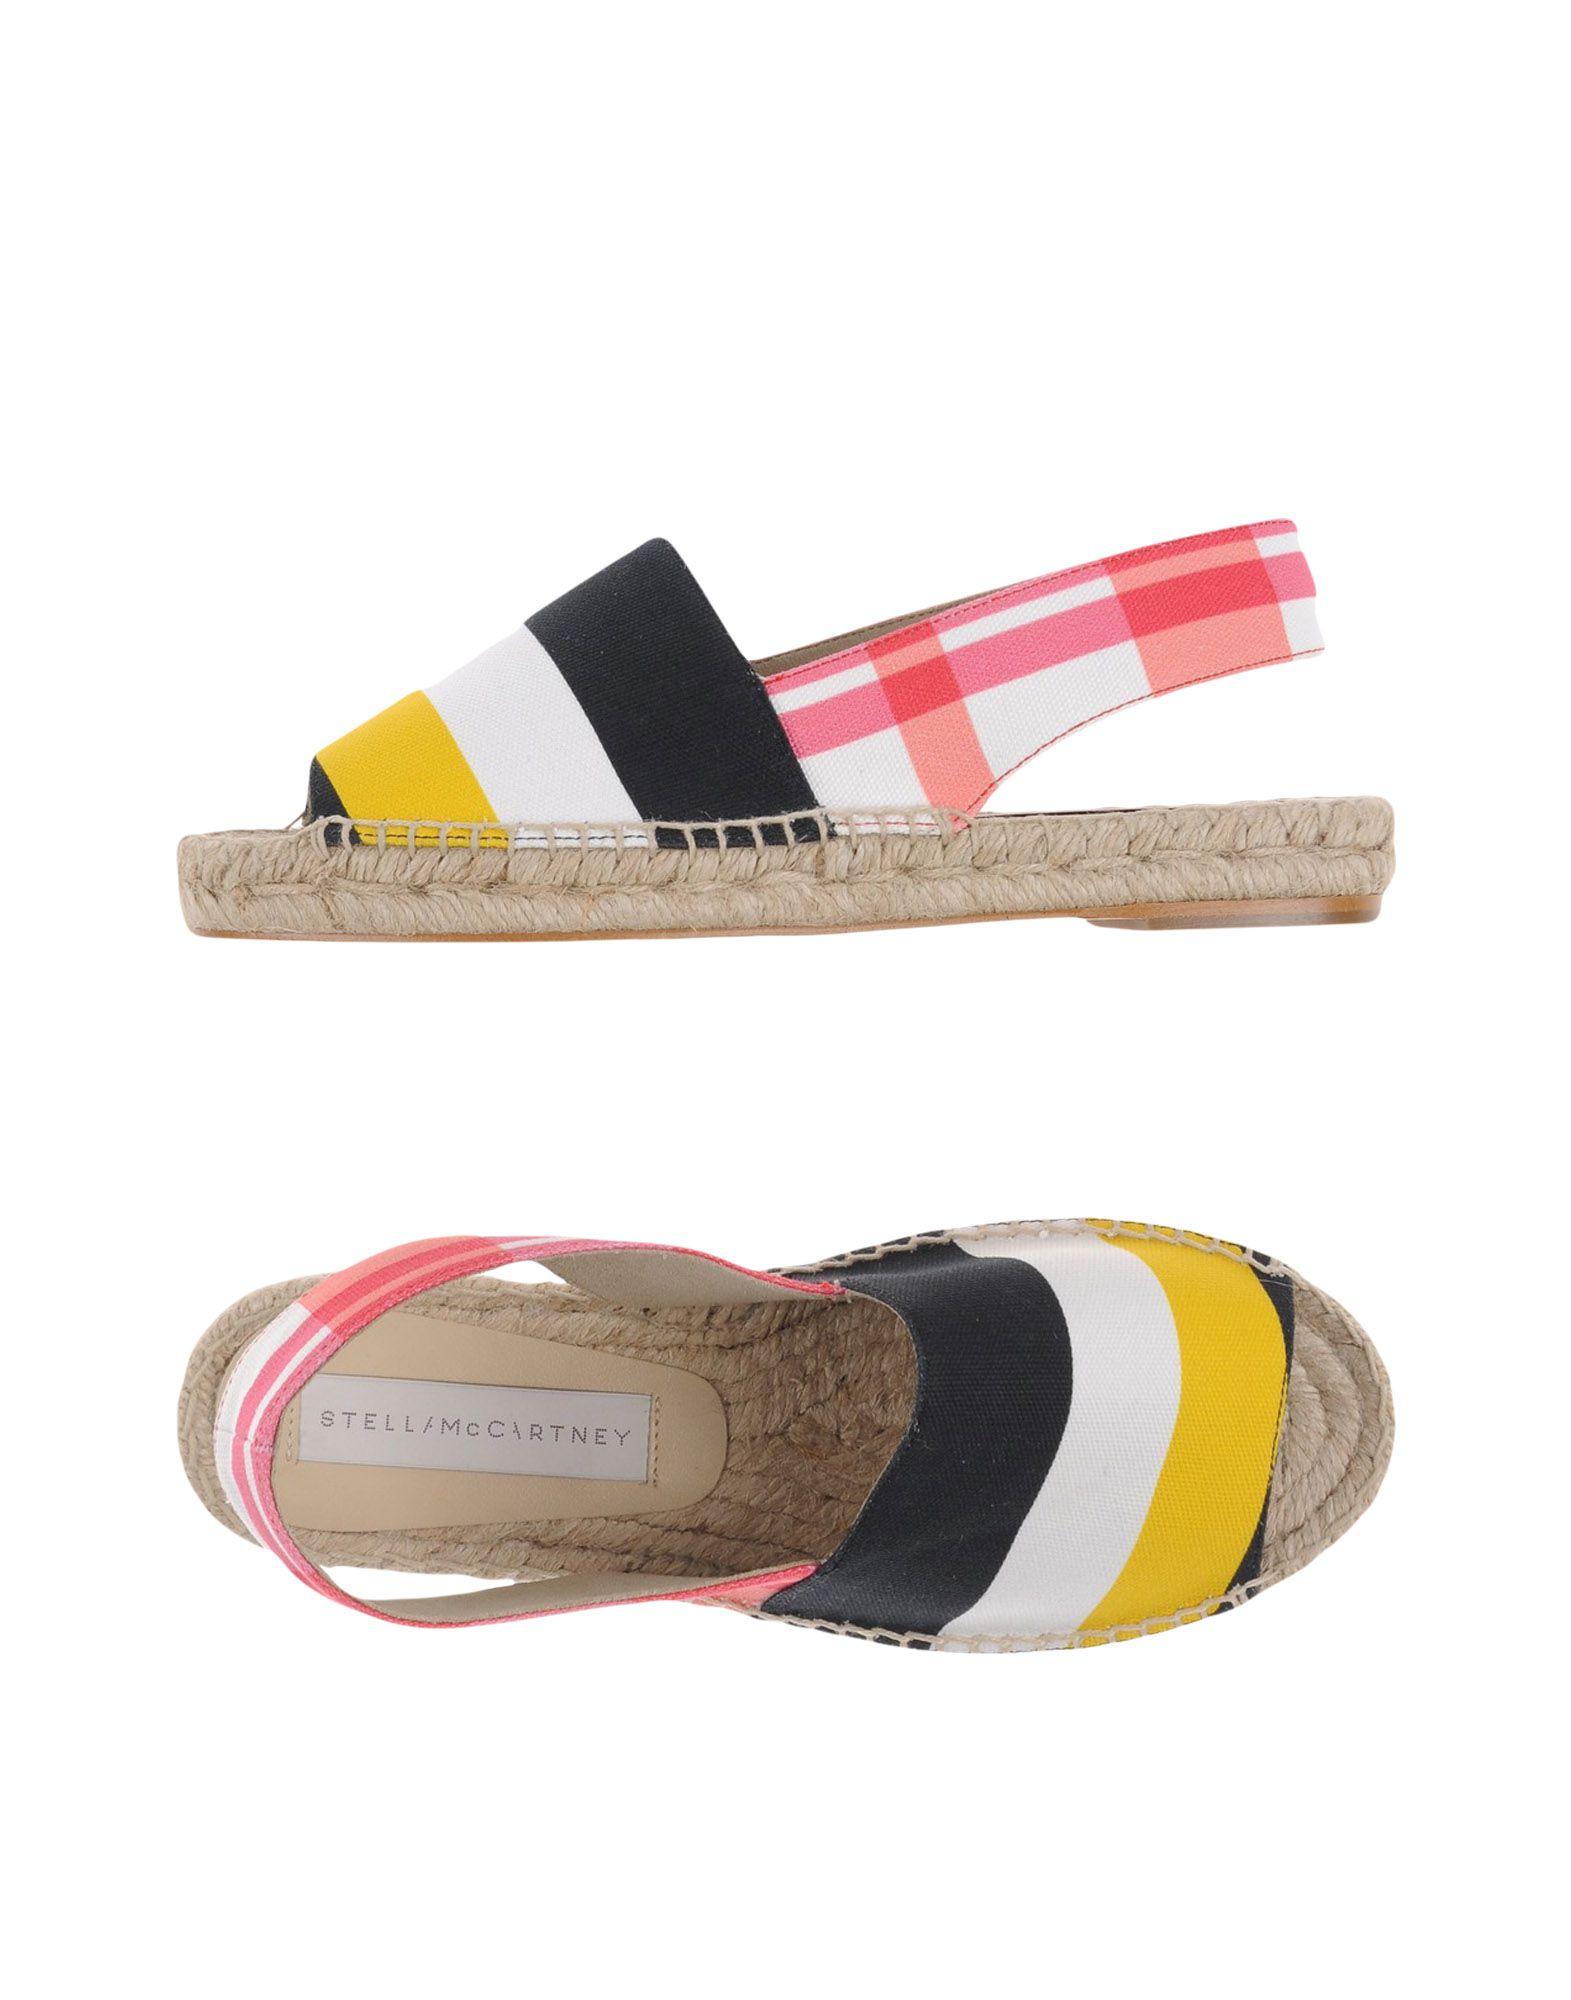 Stilvolle billige Schuhe Stella Mccartney 11178190LV Espadrilles Damen  11178190LV Mccartney 546ddd